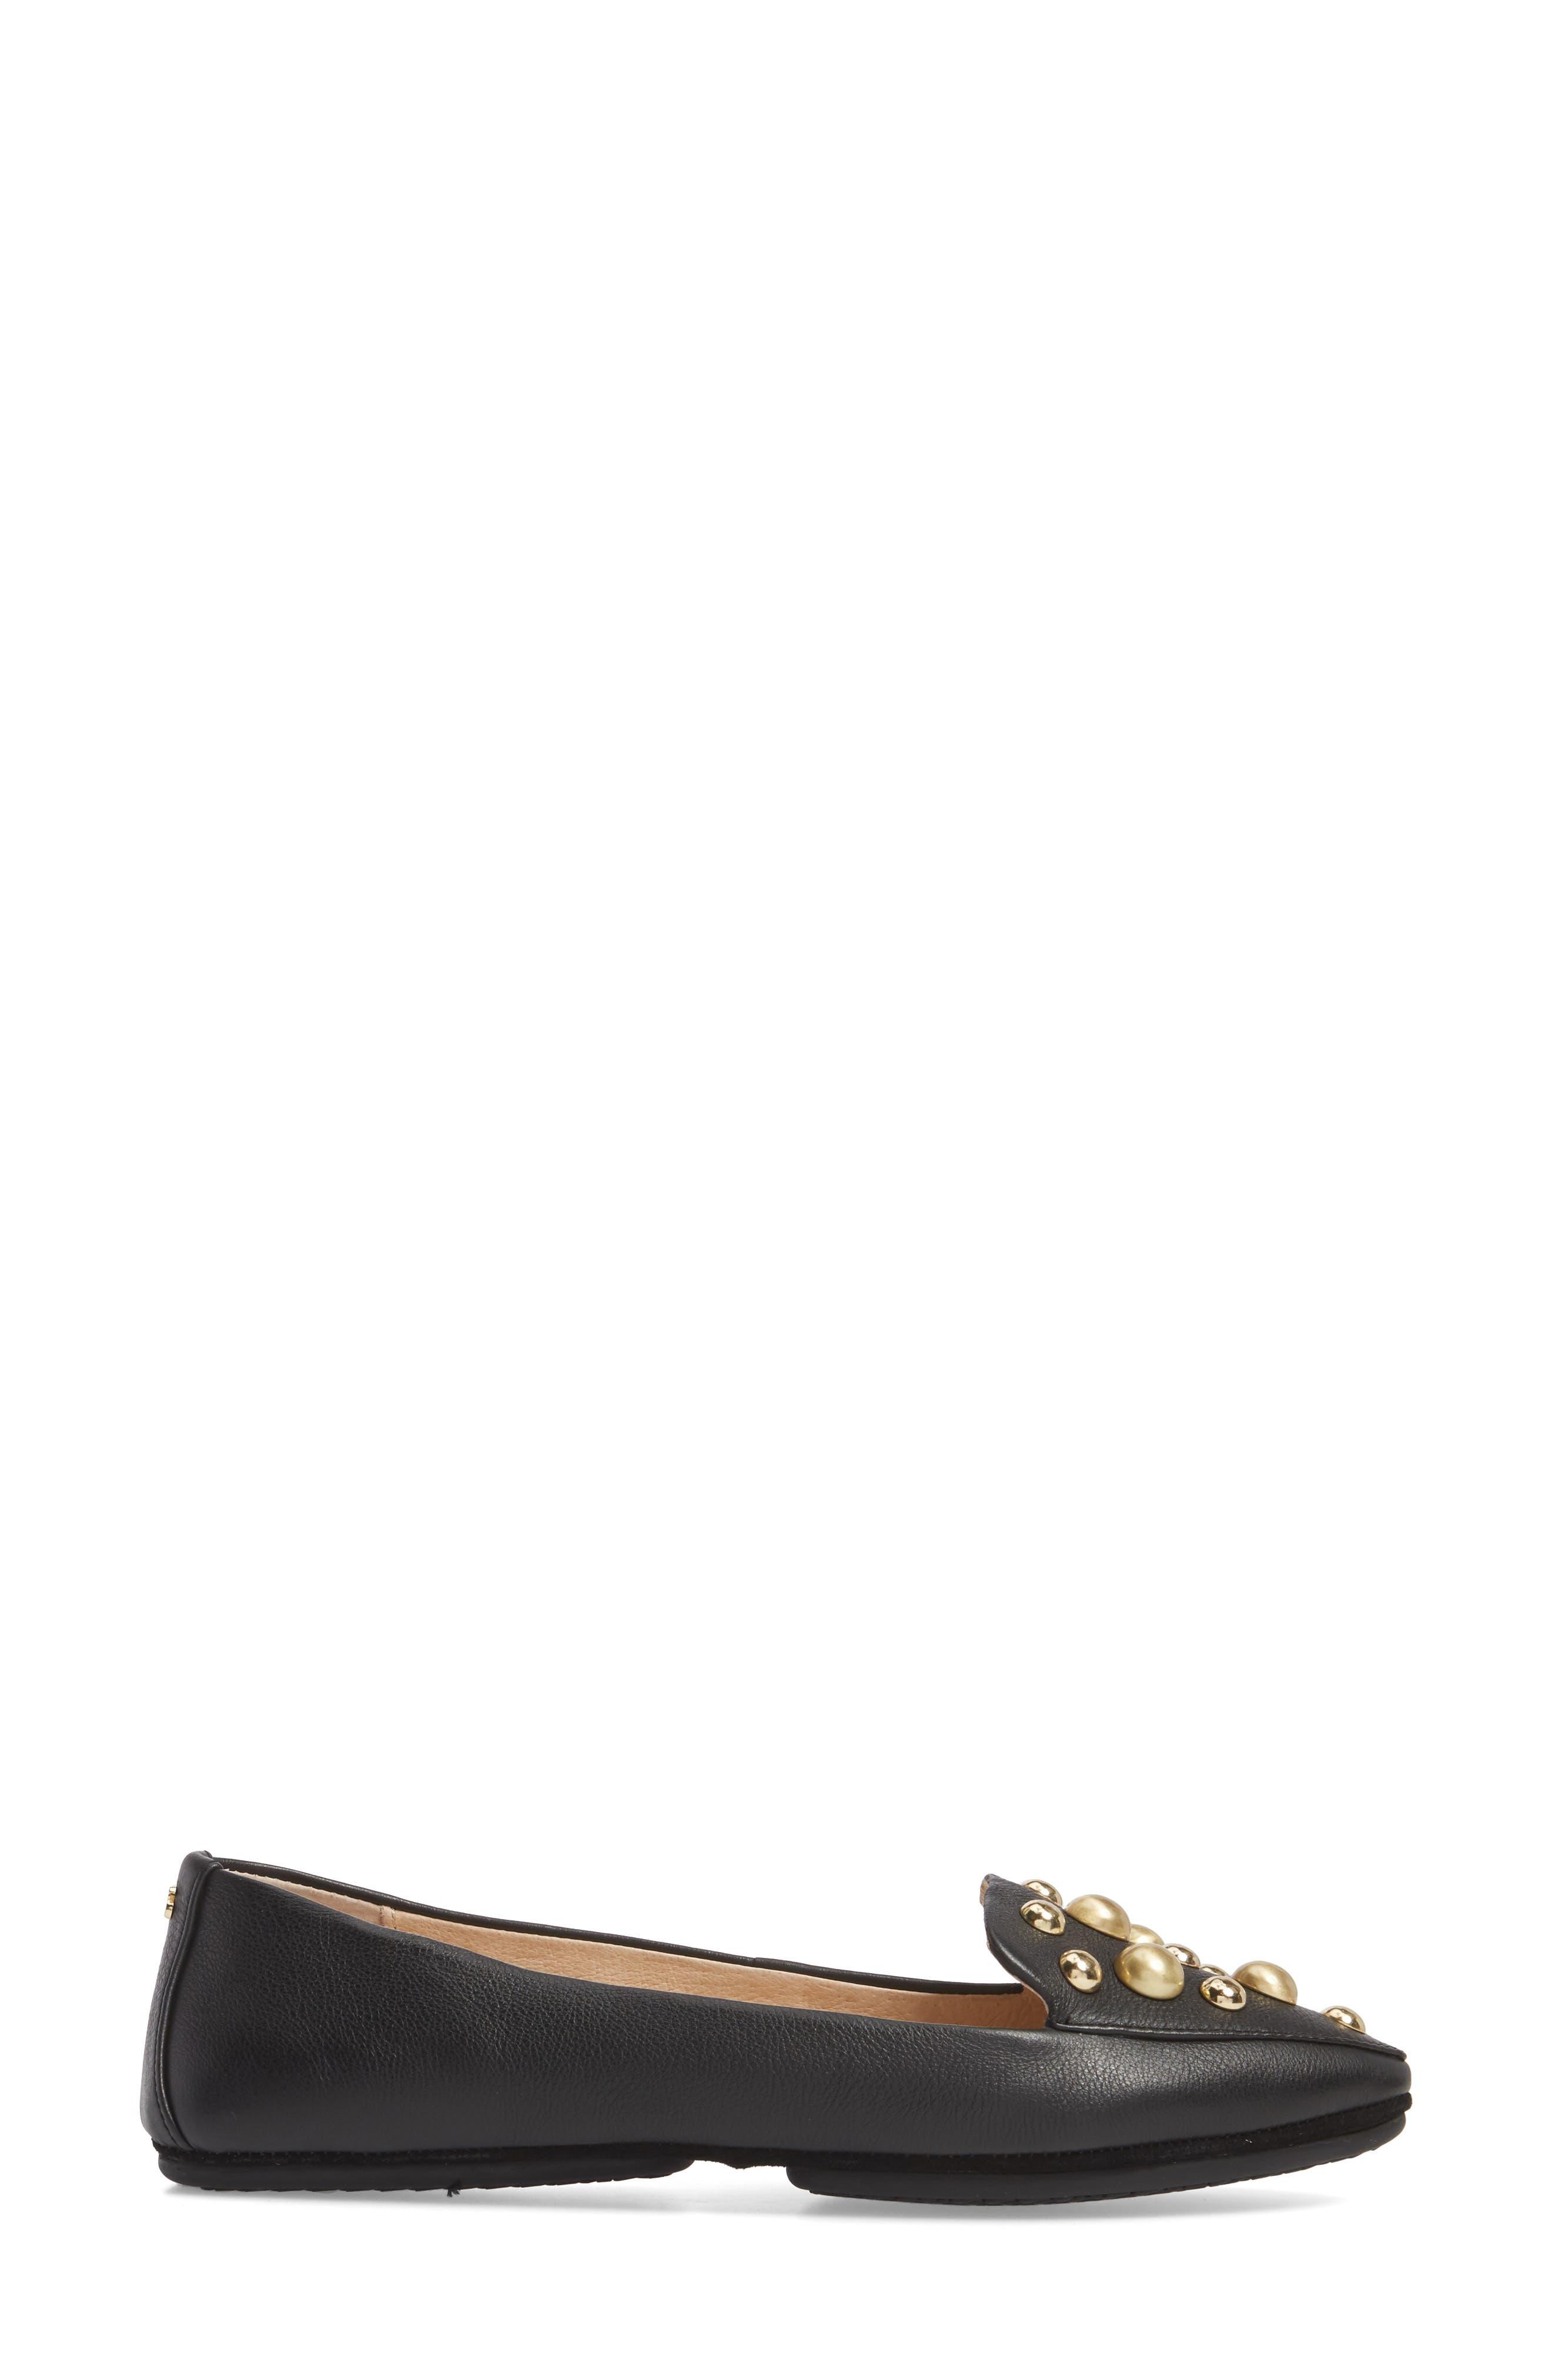 Vera Studded Loafer,                             Alternate thumbnail 3, color,                             Black/ Black Leather